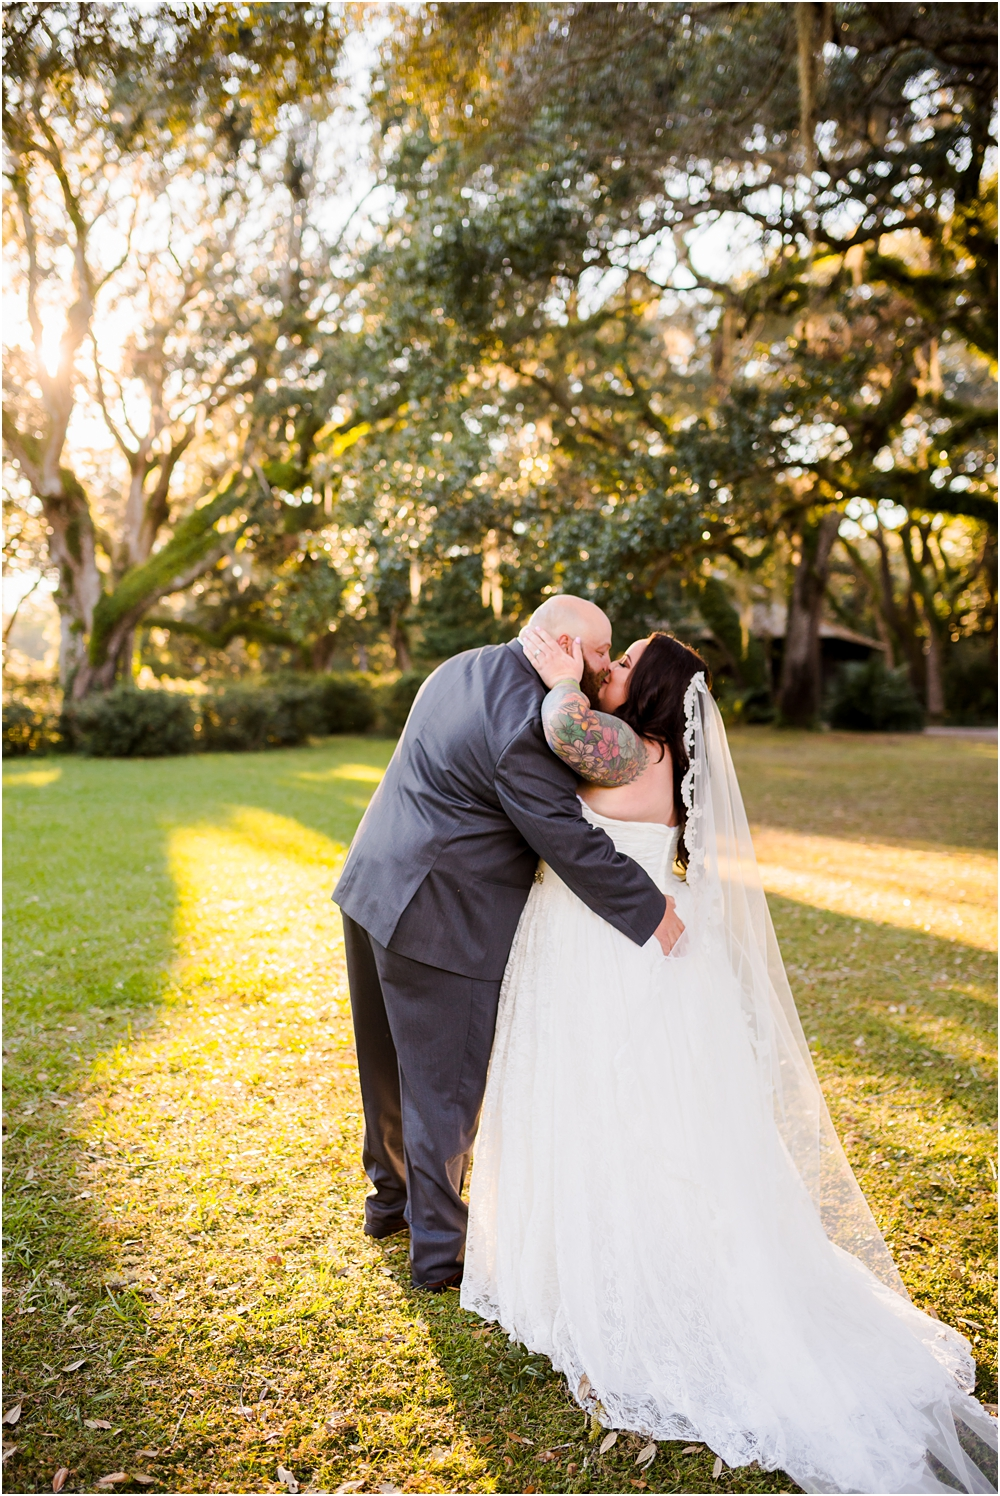 Eden-Gardens-florida-wedding-photographer-kiersten-stevenson-photography-80.jpg